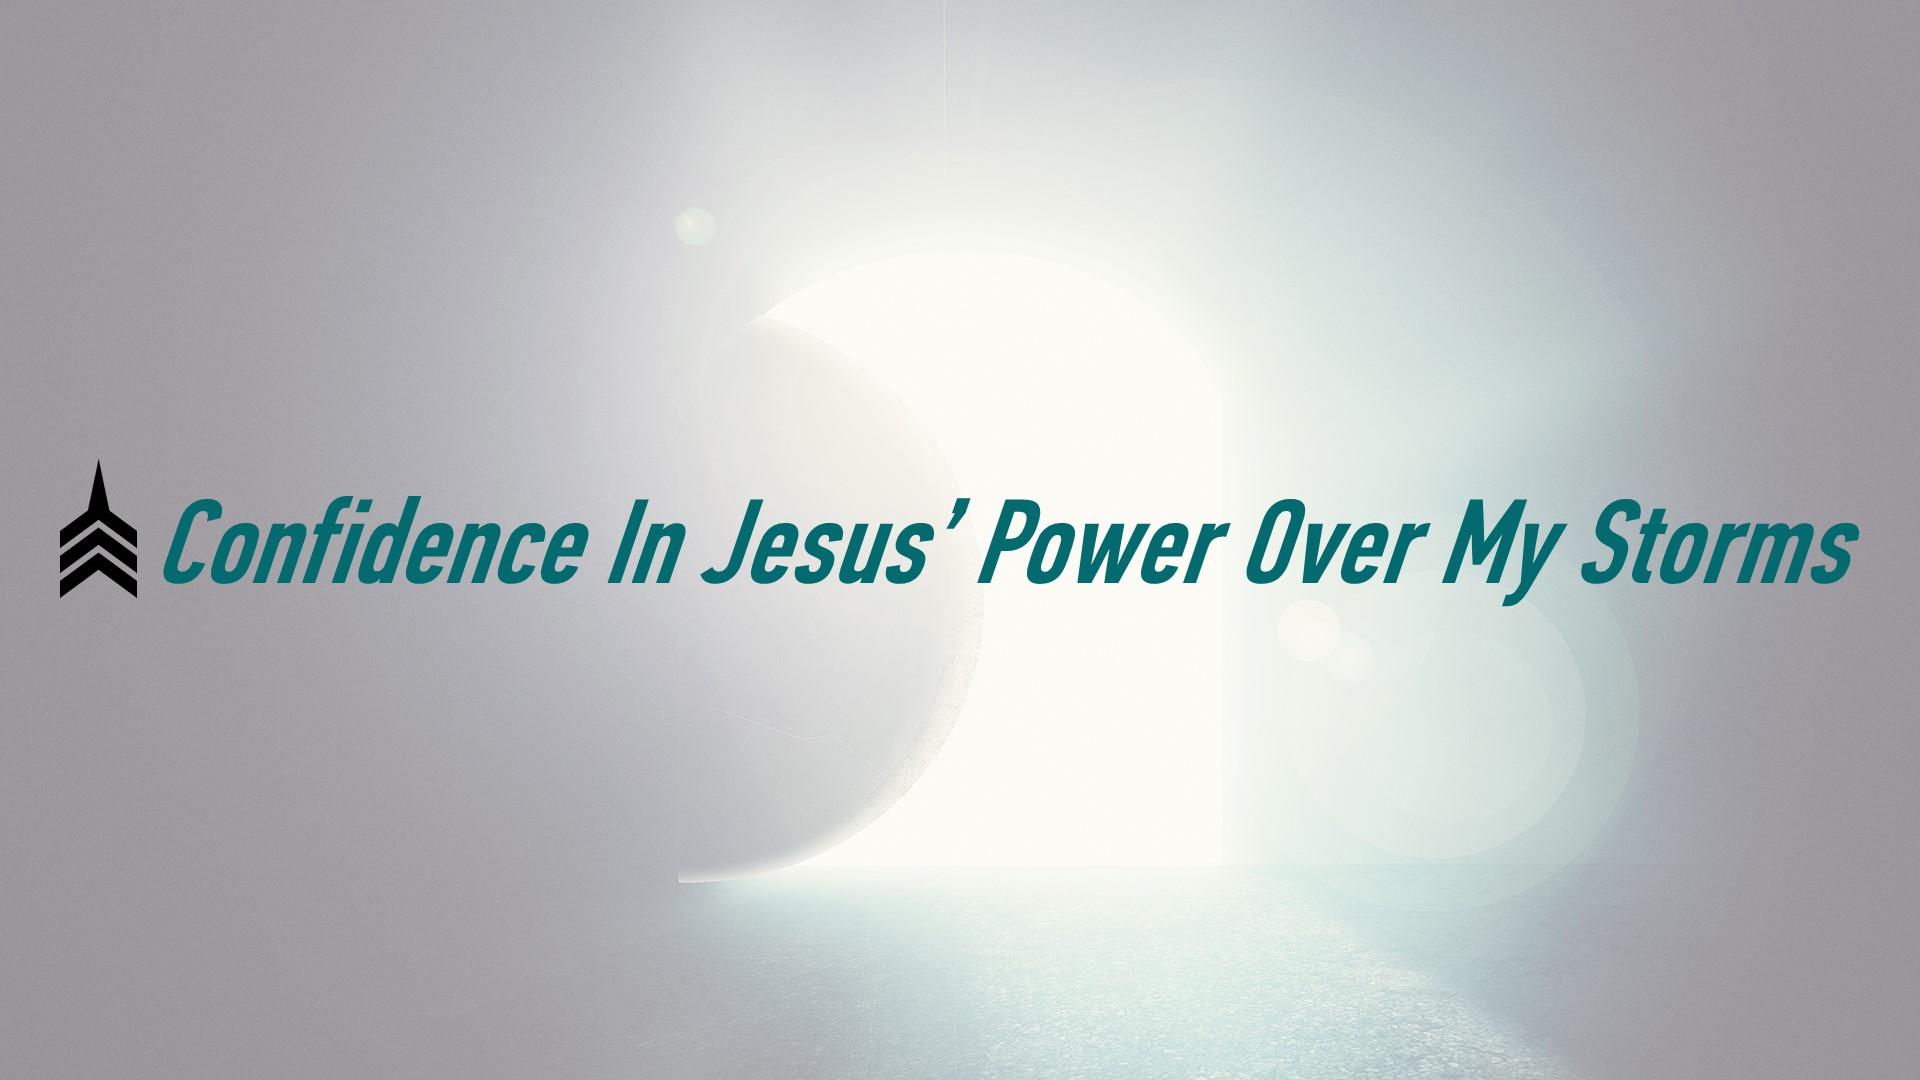 Confidence In Jesus' Power Over My Storms.JPG